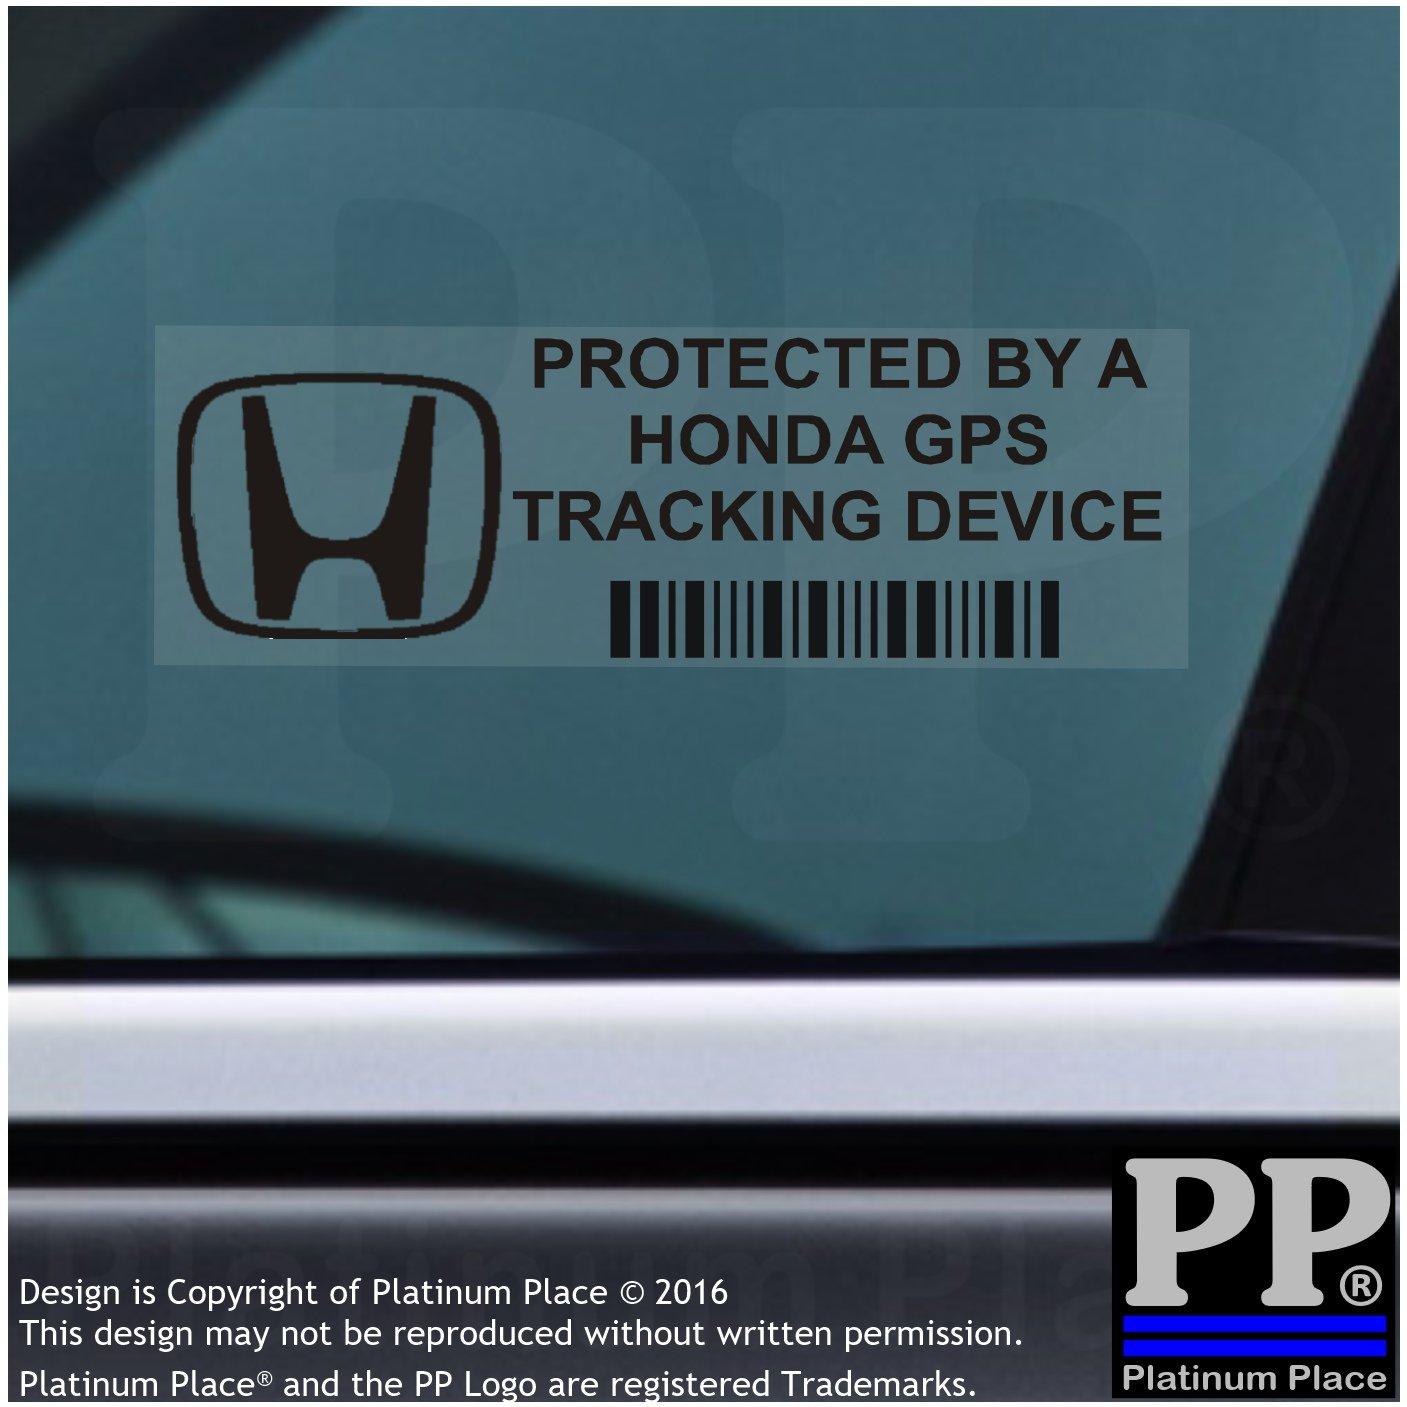 Van alarma Tracker 5/x pphondagpsblk GPS negro dispositivo de seguimiento de seguridad ventana pegatinas 87/x 30/mm-car